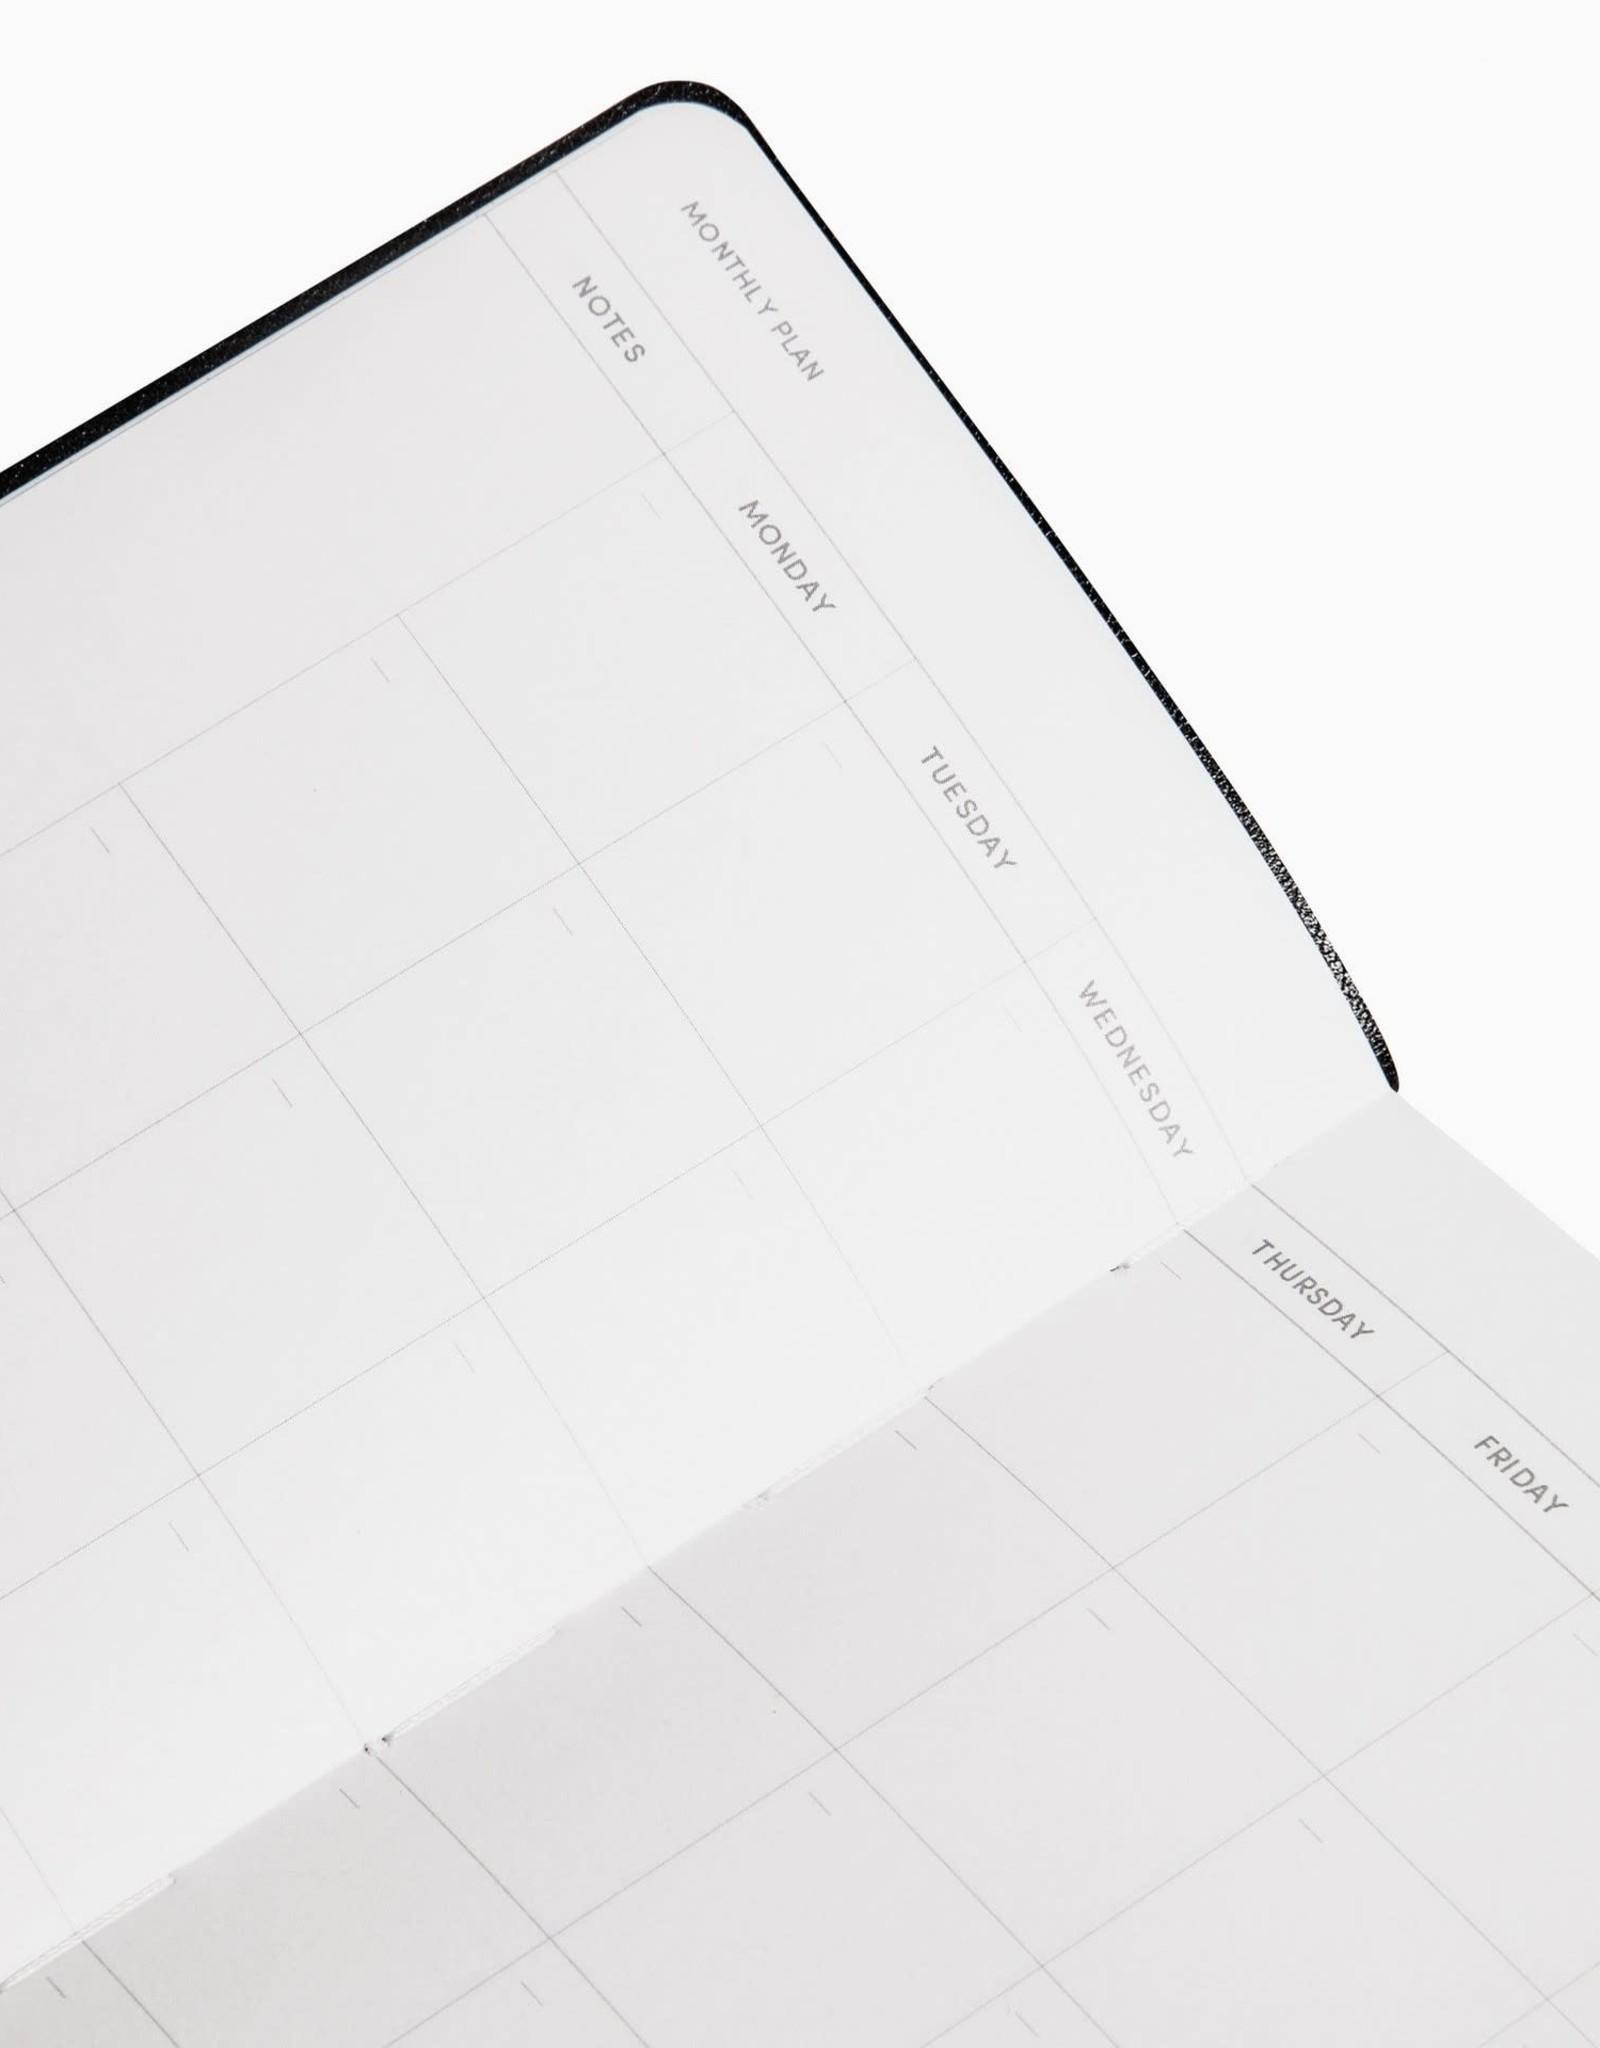 Poketo Poketo | A Simple Planner